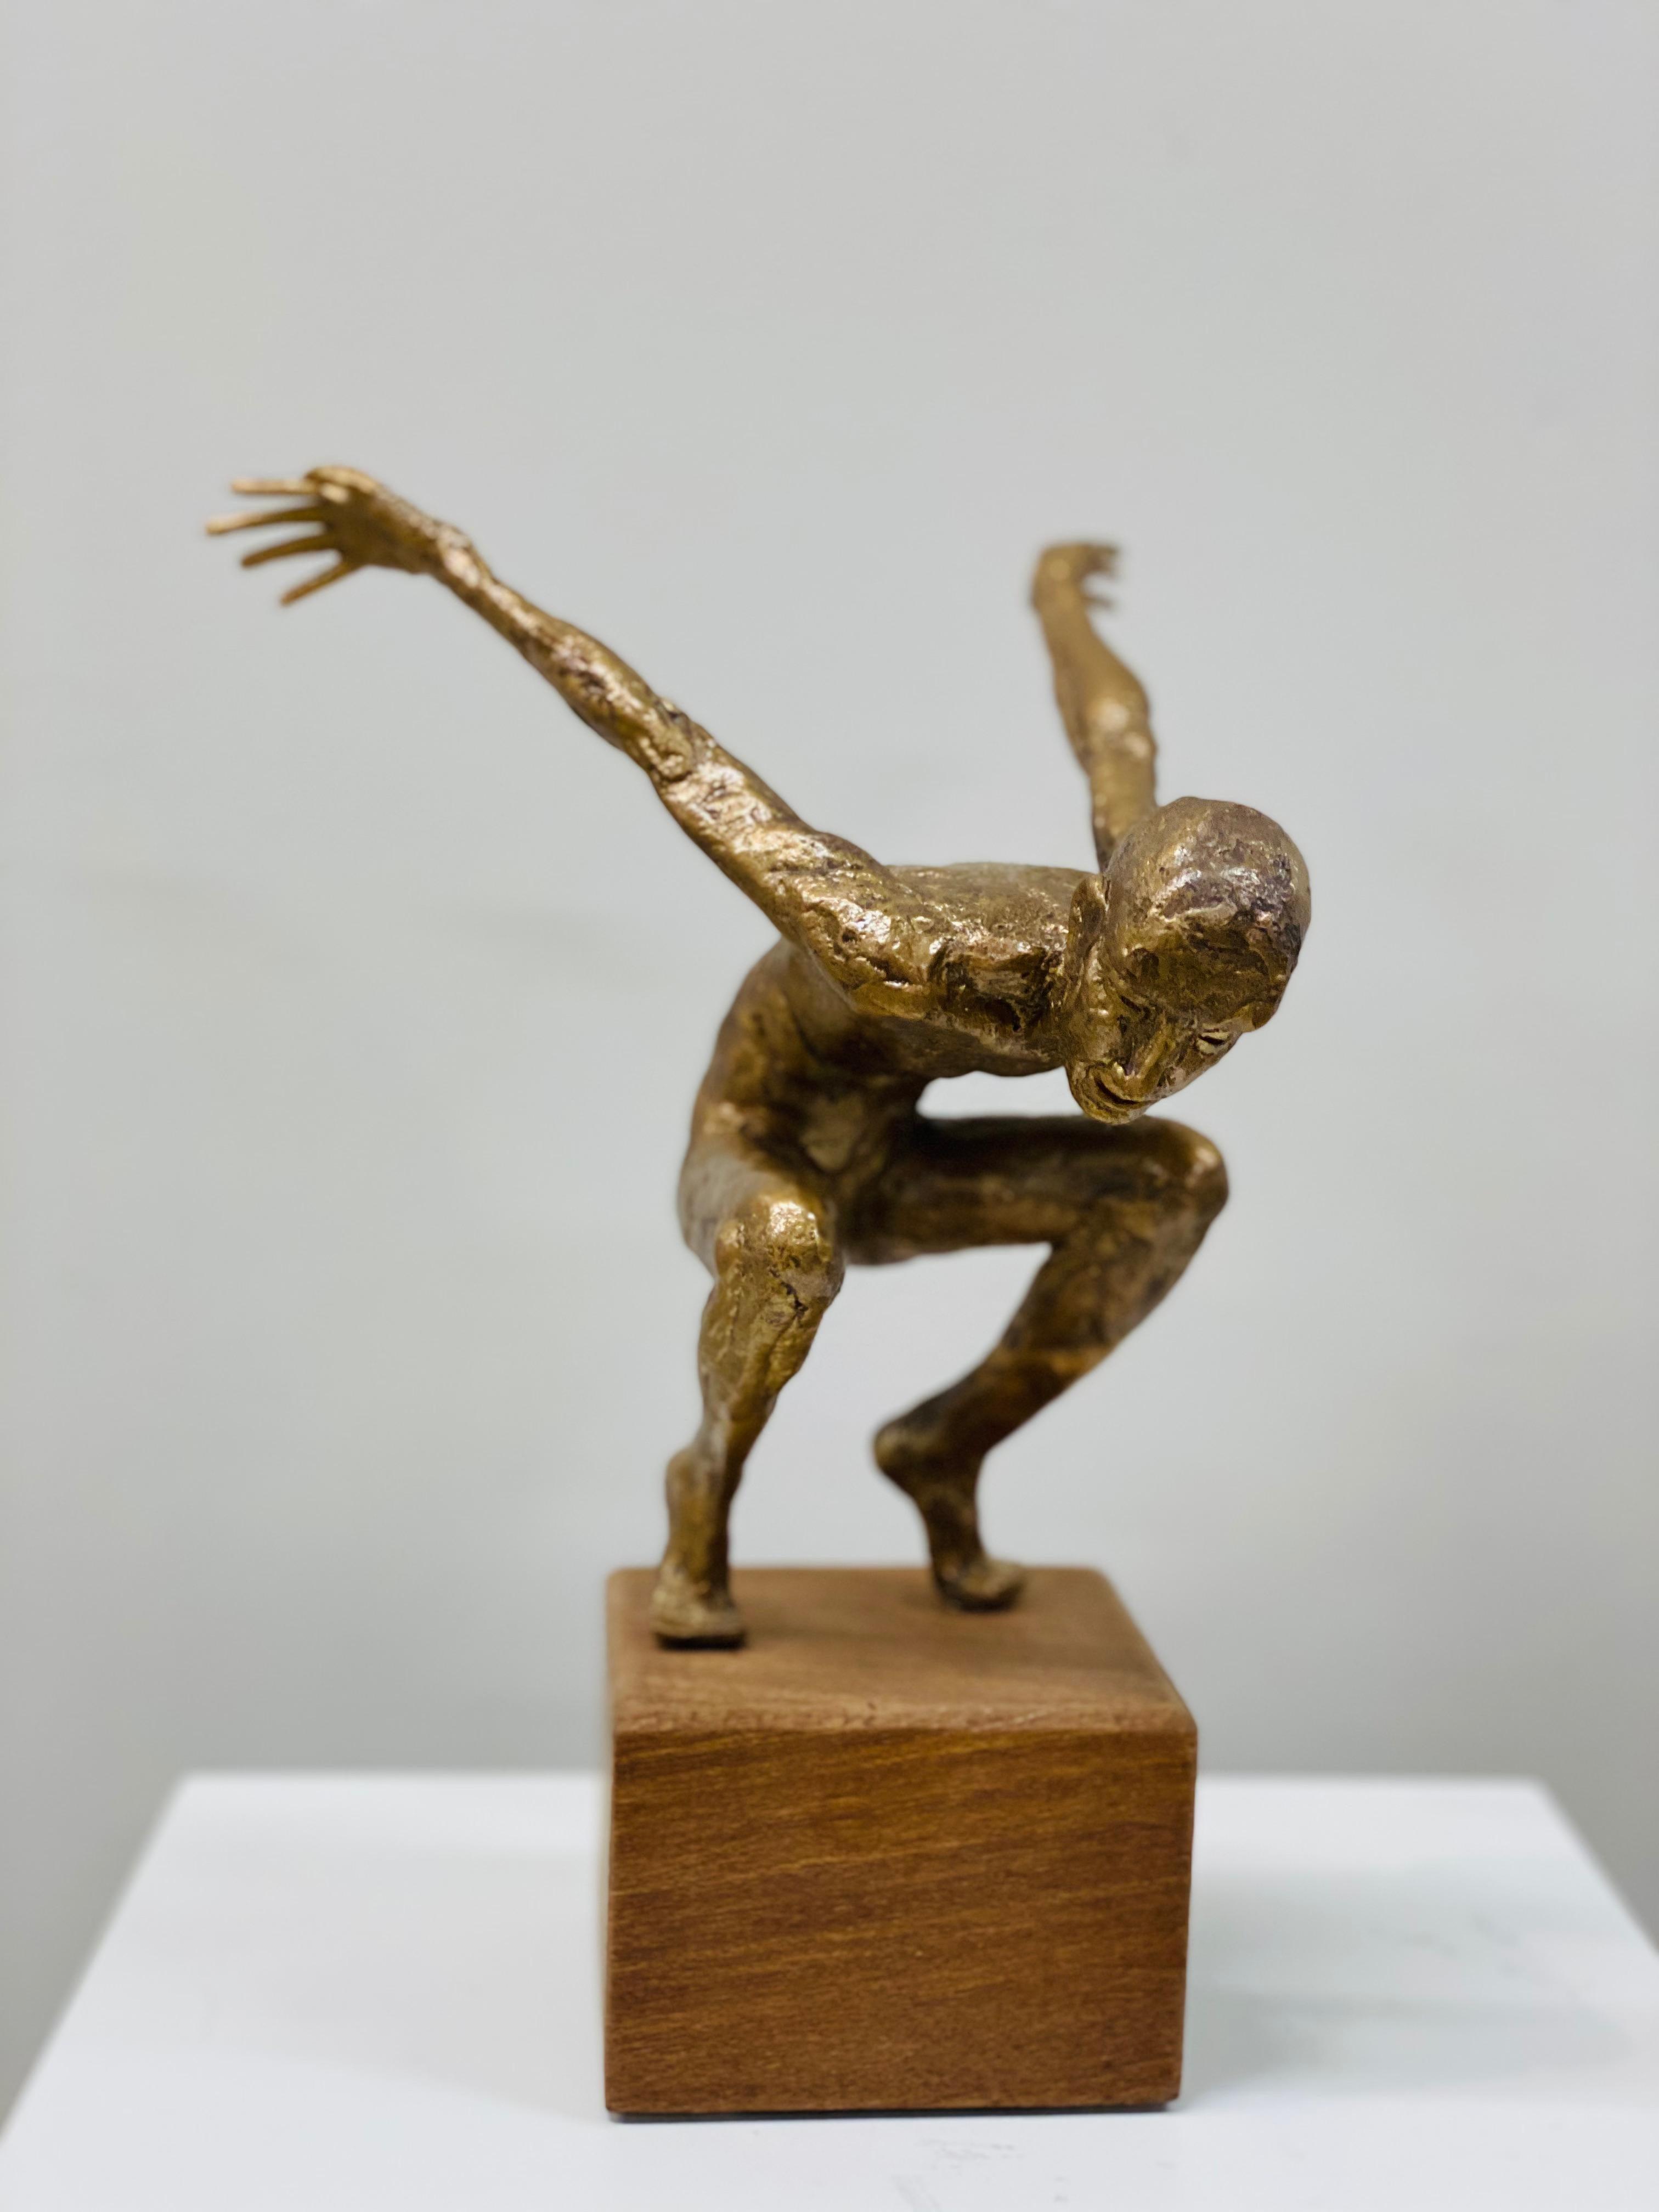 Dancer VII- 21st Century Bronze Sculpture of a Male Nude Dancer